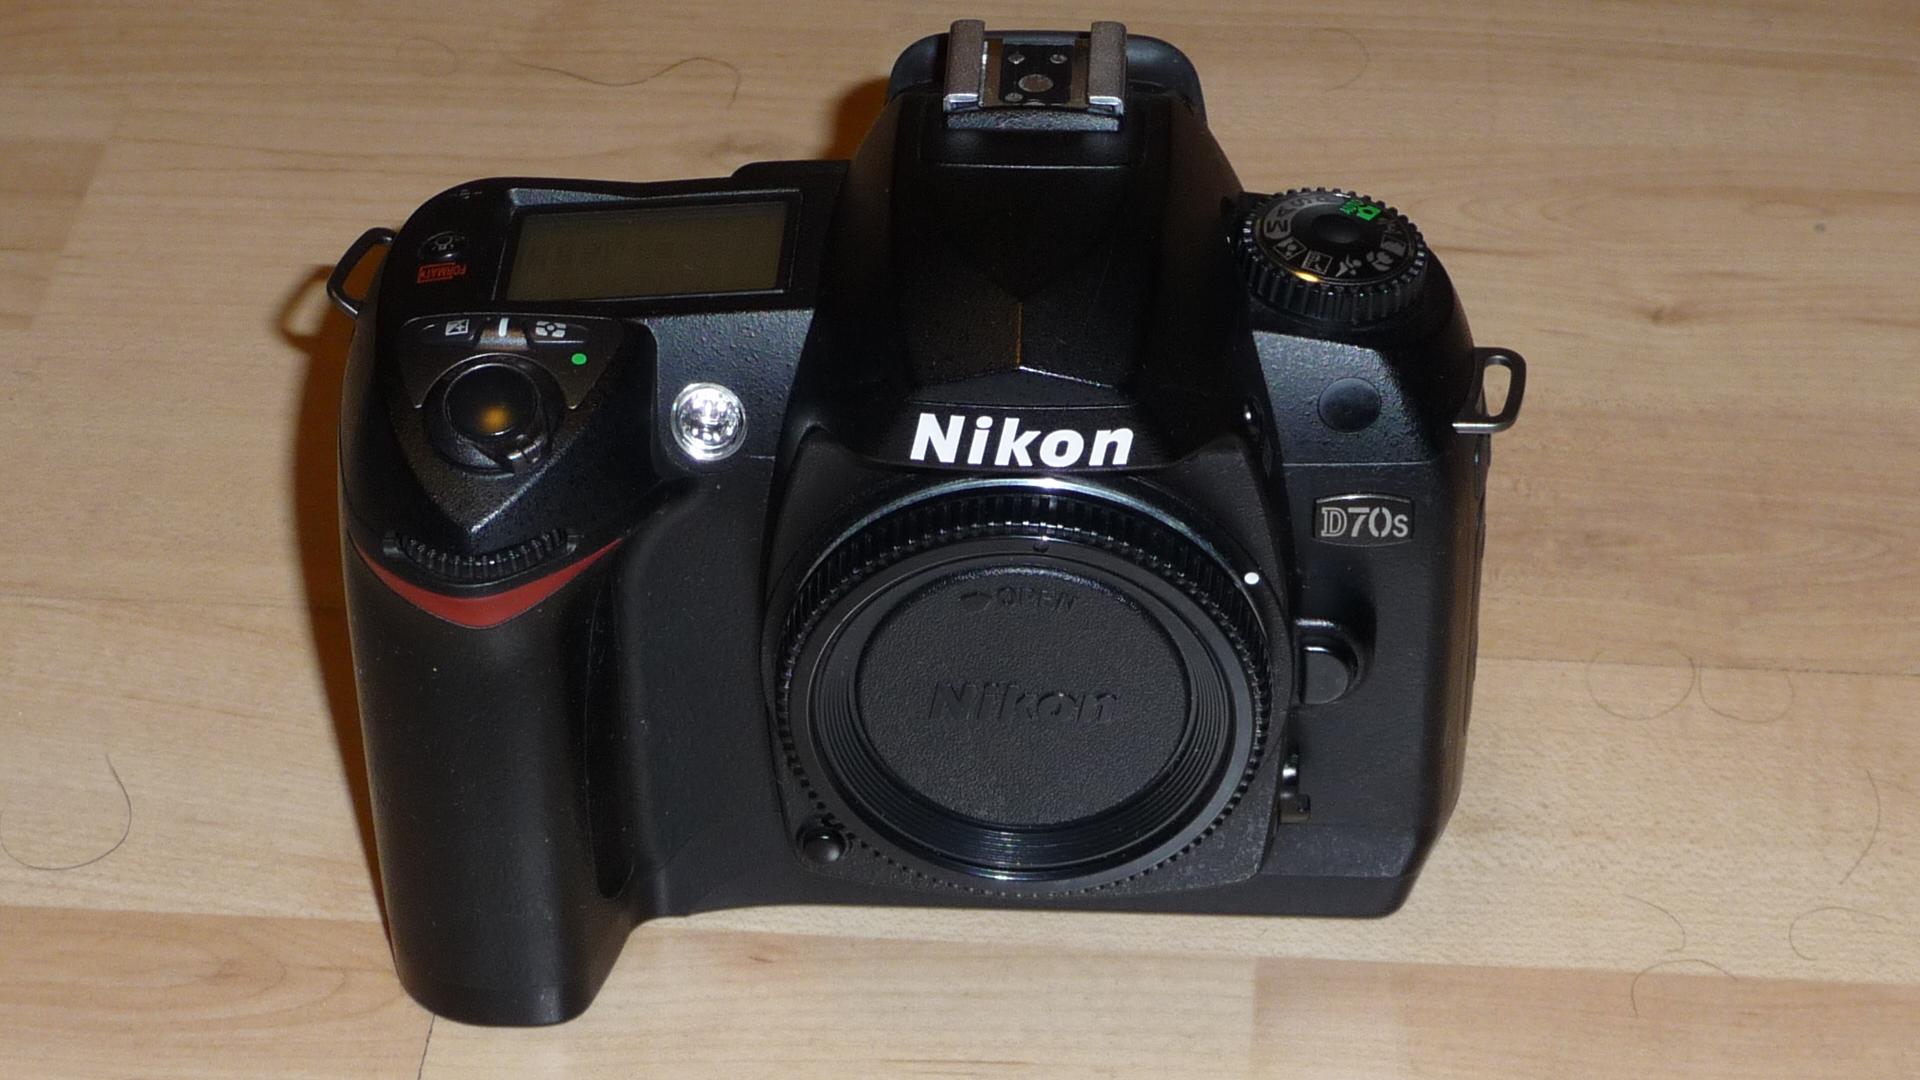 54441_NikonD70S-1_122_486lo.JPG